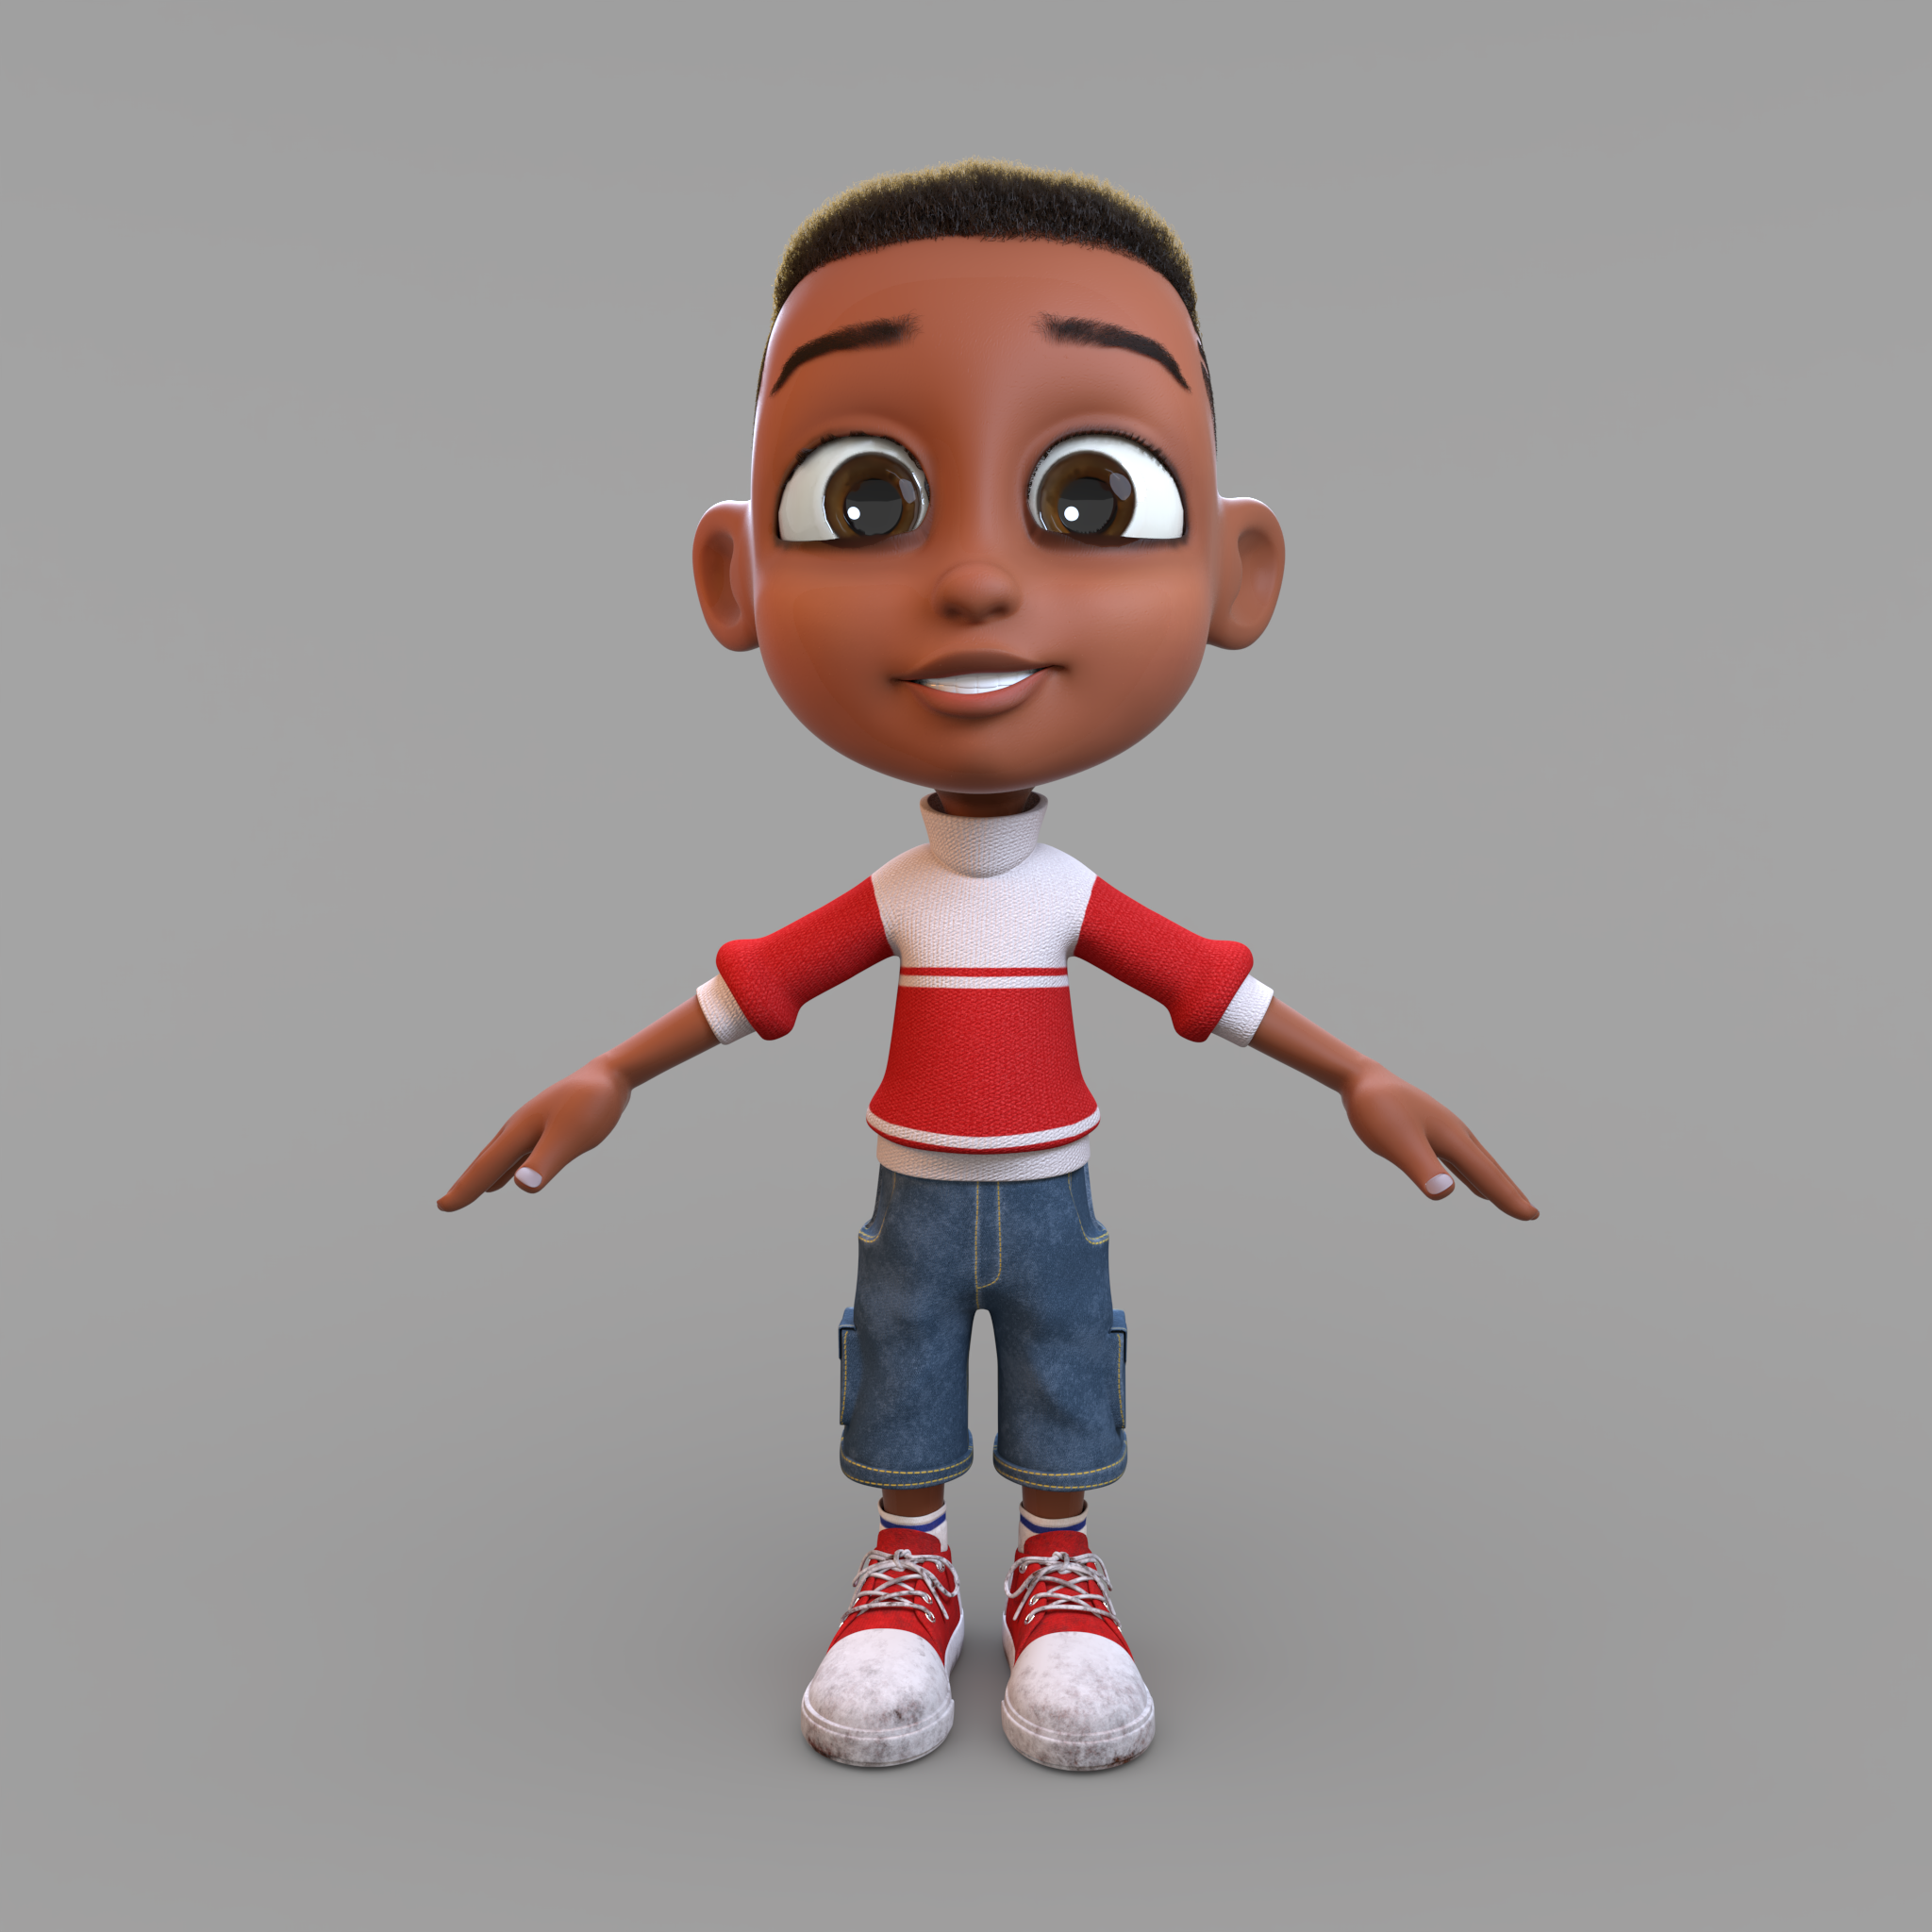 Habib - Age: 8Origin: Born in Ibadan in Rosemary's orphanage.Traits: Intelligent, Adventurous, Agreeable.Likes: Jollof RiceFunke's best friend.